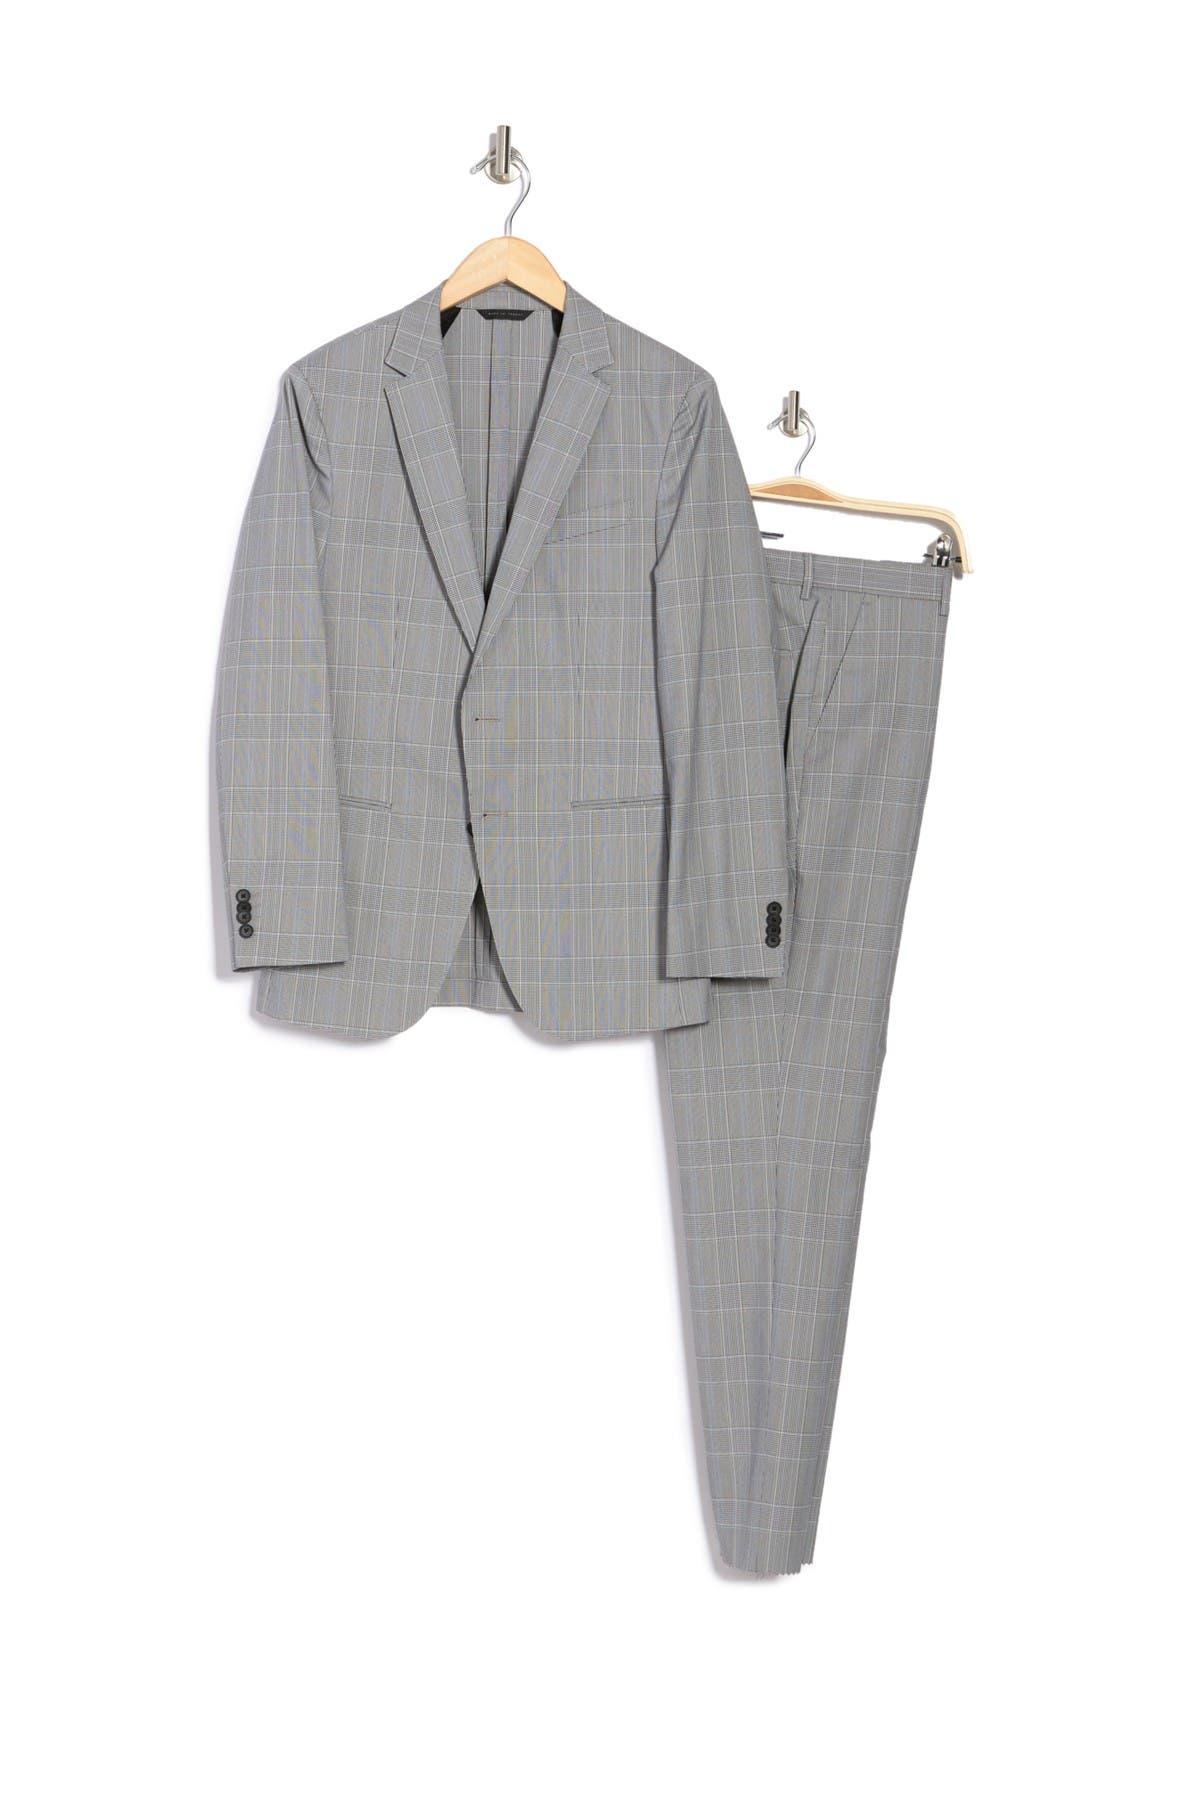 Image of BOSS Nolin Pirko Dark Blue Plaid Notched Lapel Suit